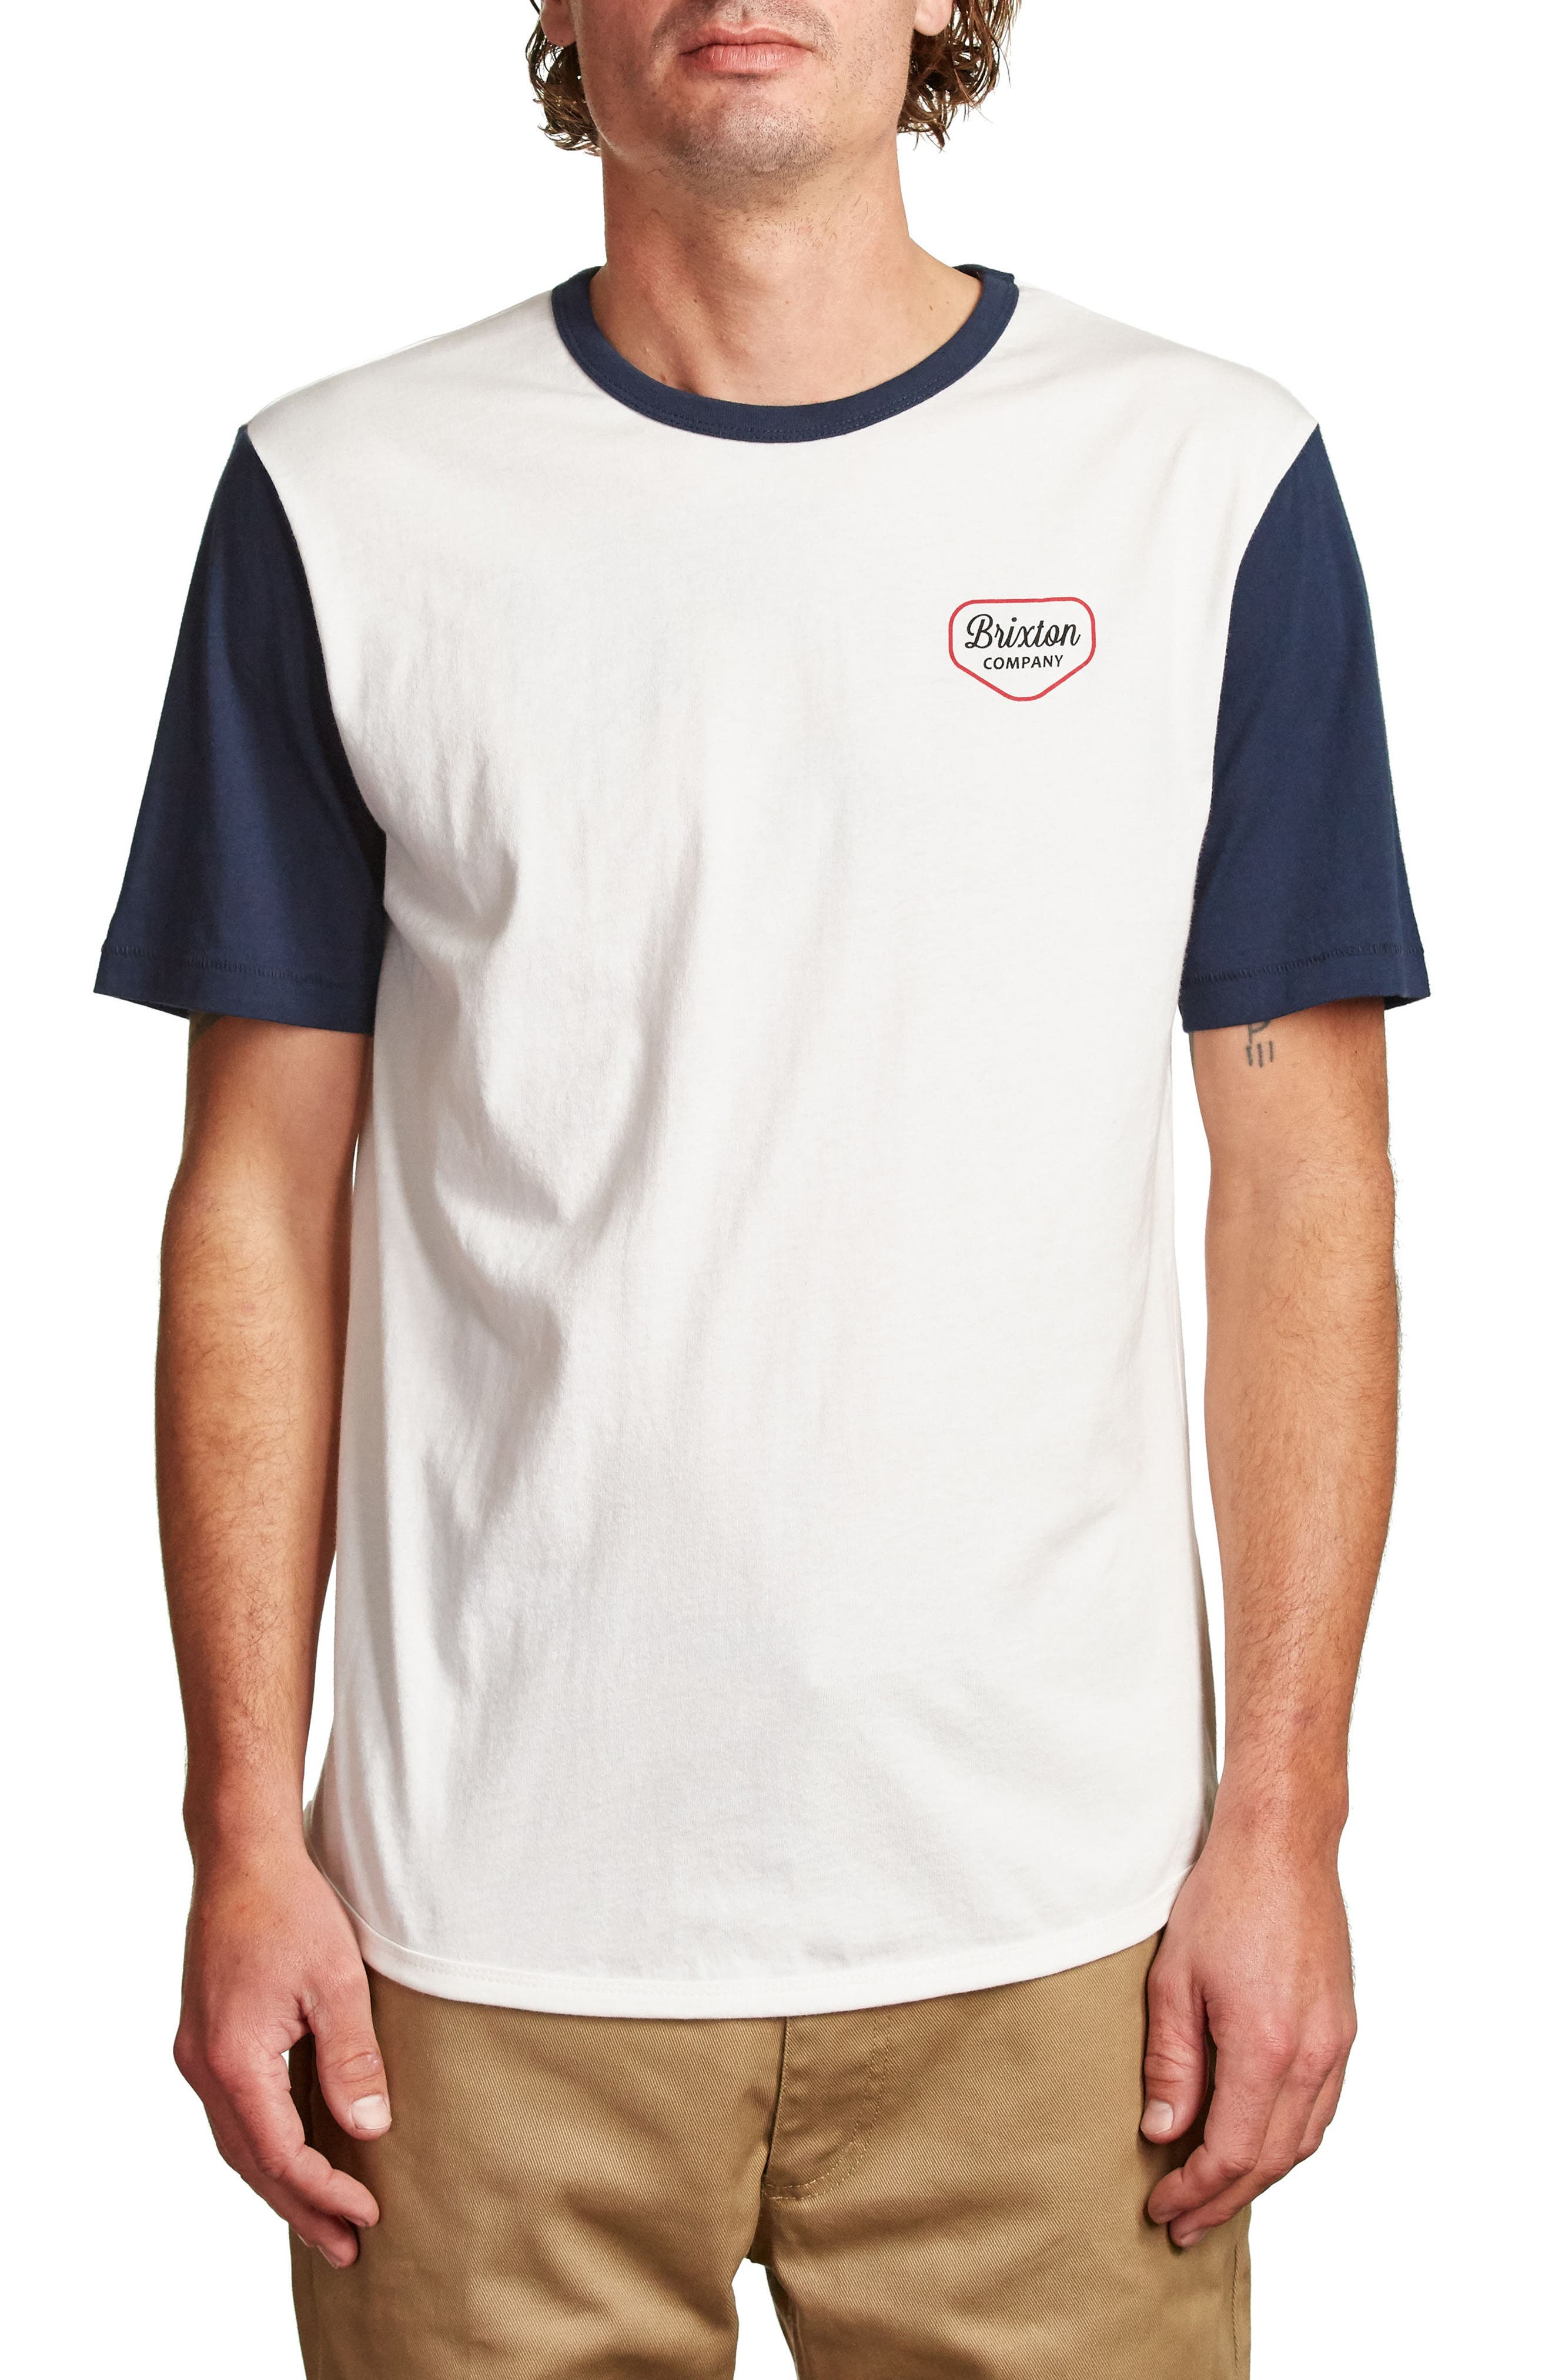 Novato T-Shirt,                             Main thumbnail 1, color,                             Off White/ Navy